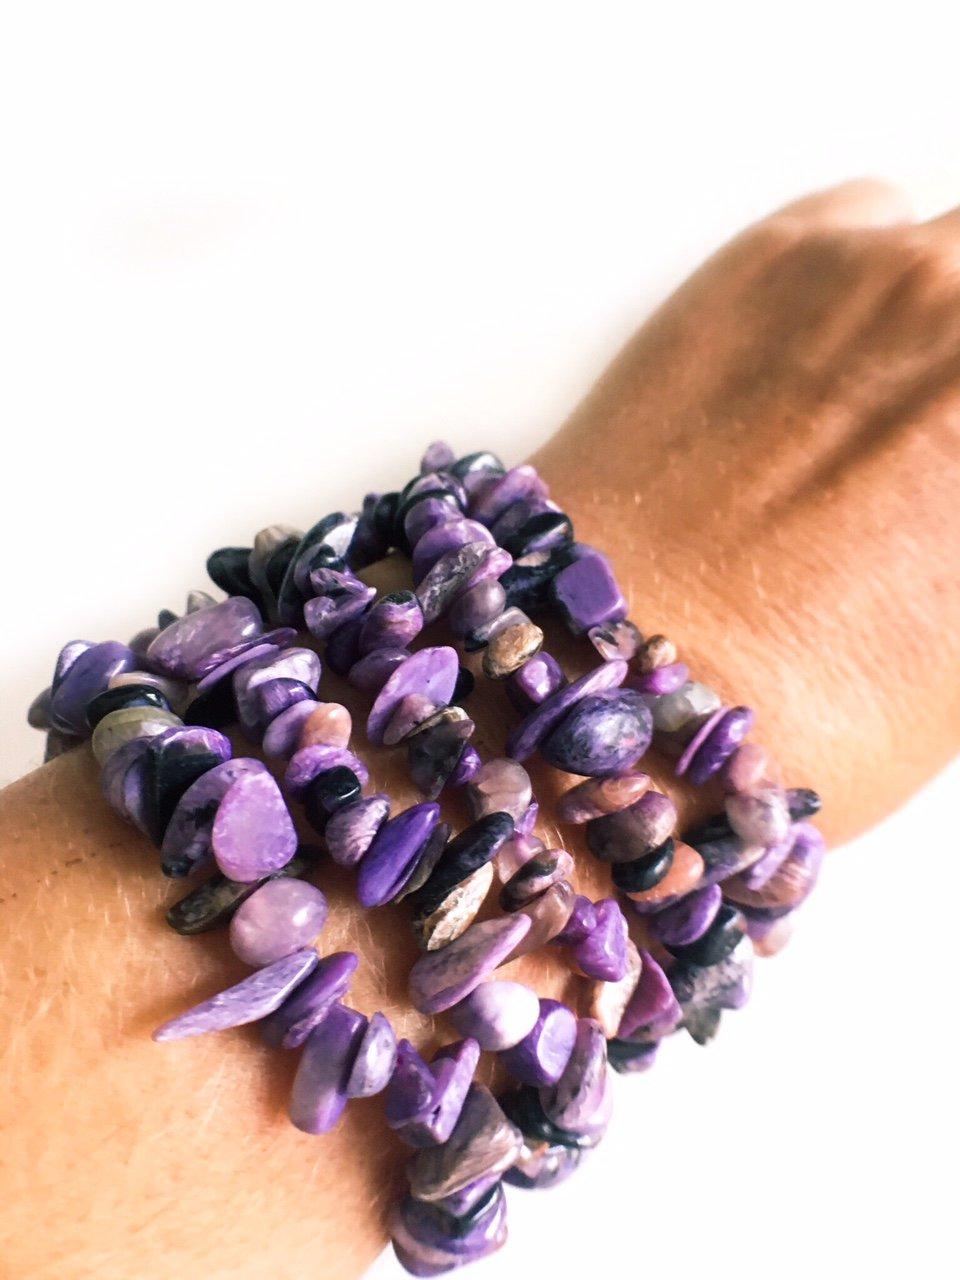 Charoite Healing Bracelet 100% Natural Genuine Charoite from Russia